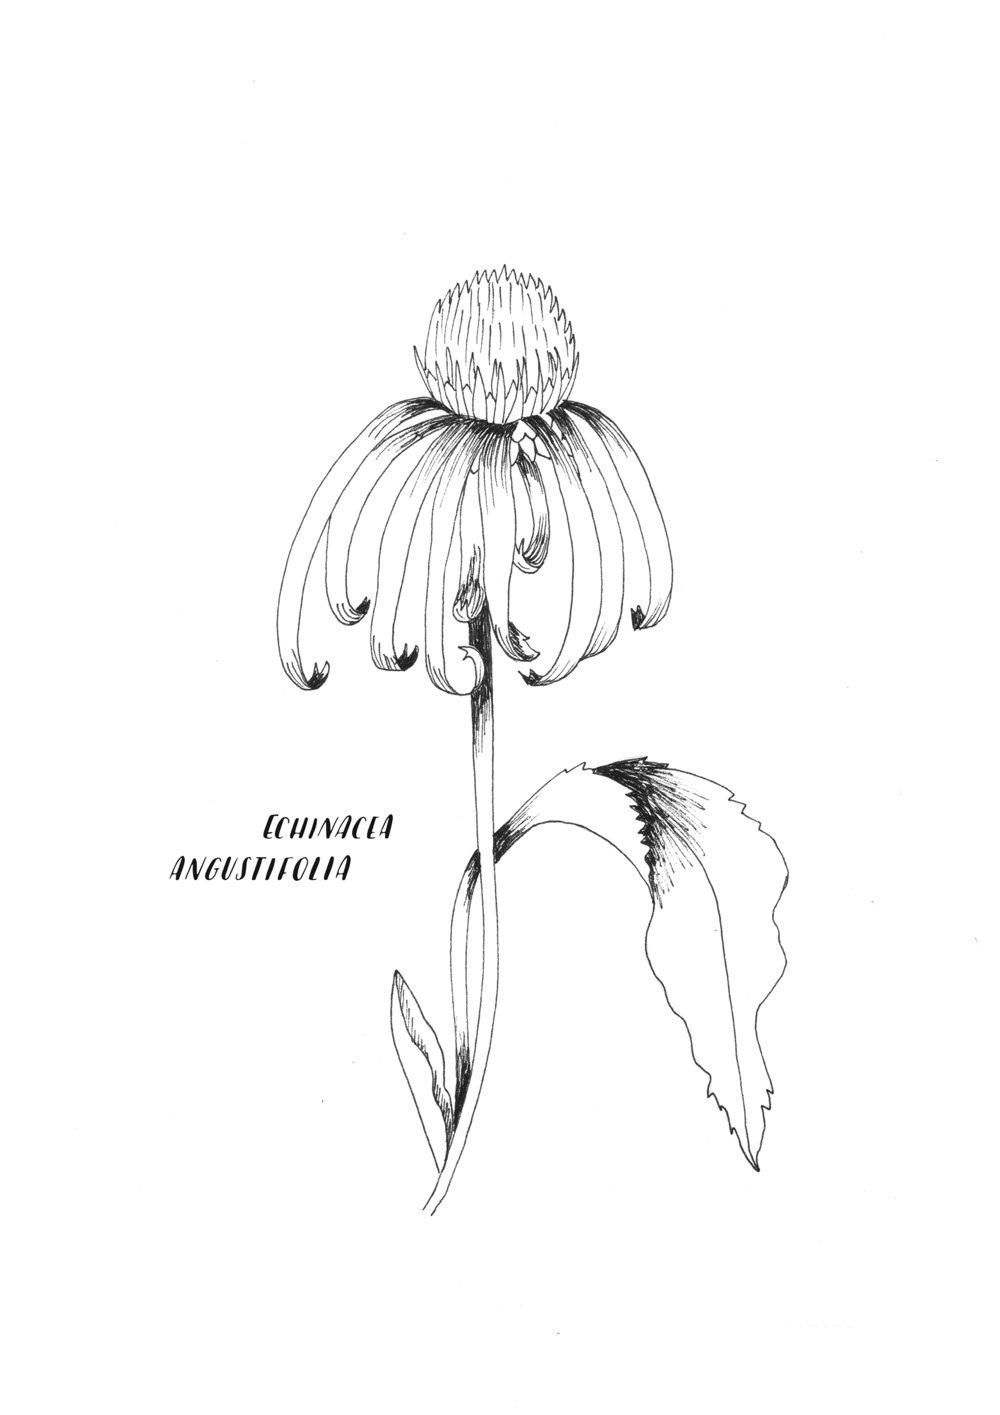 A4 ORIGINAL Echinacea Angustifolia.jpg